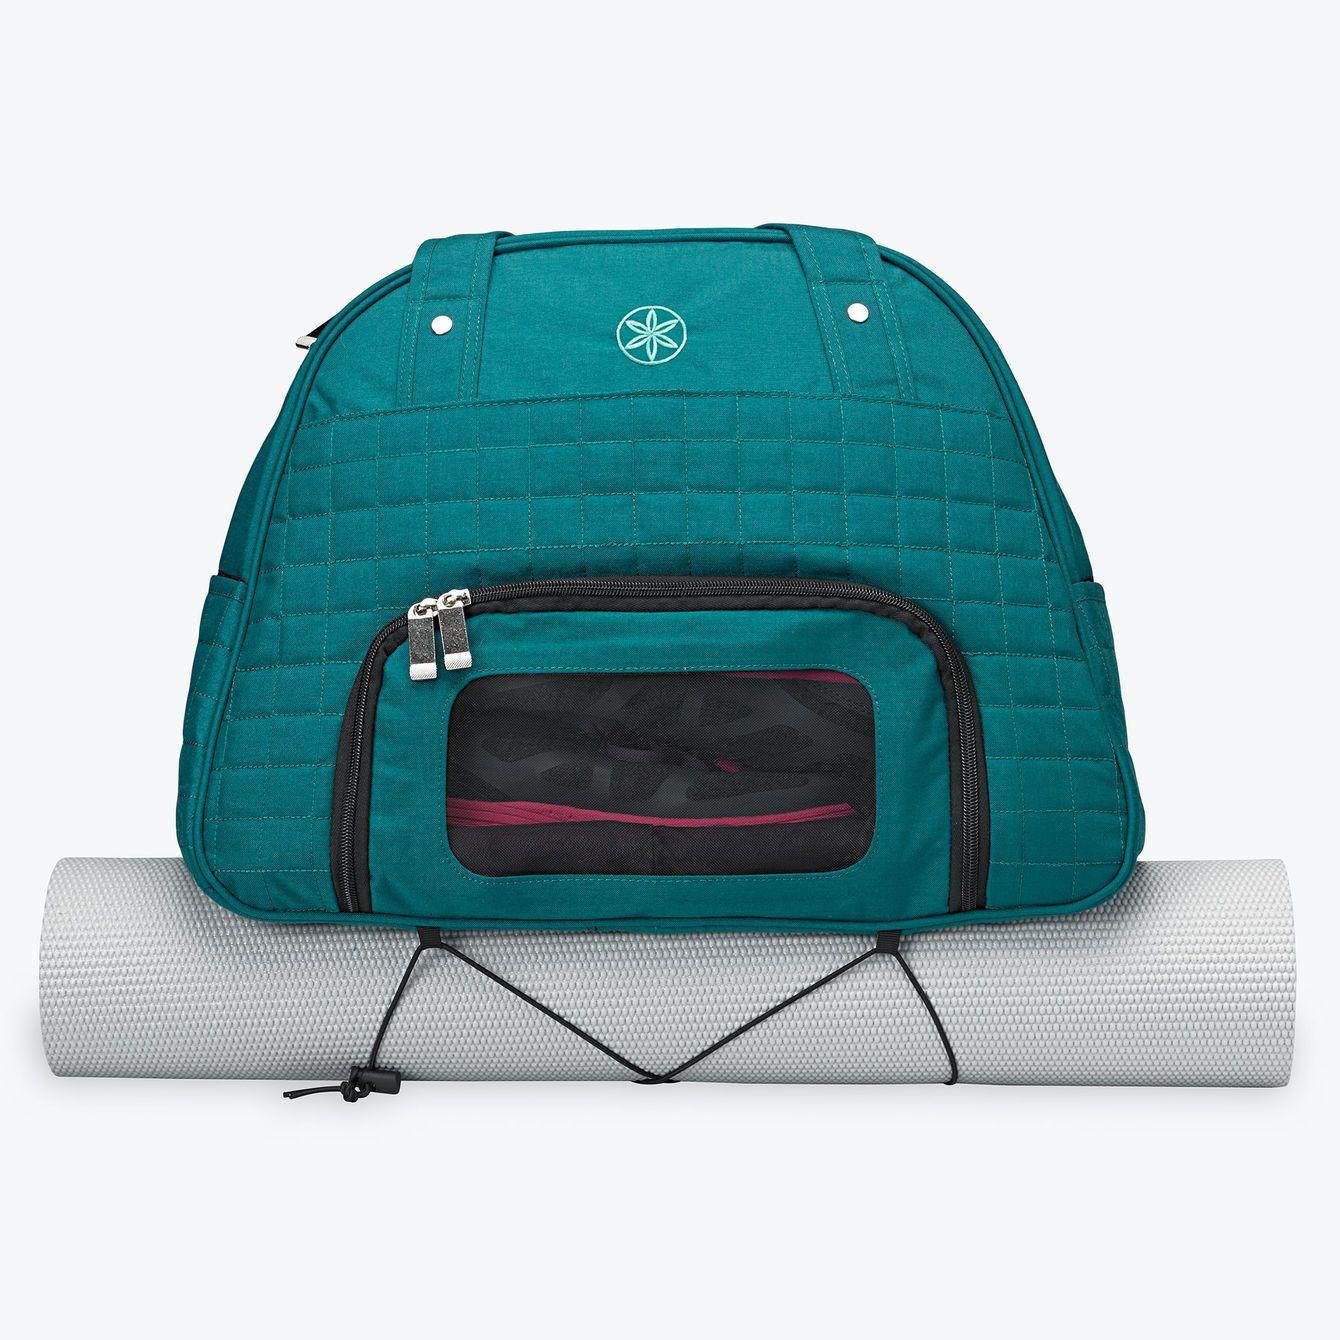 Everything Fits Gym Bag Yoga Mat Bags Gym Bag Bags Yoga Mat Bag